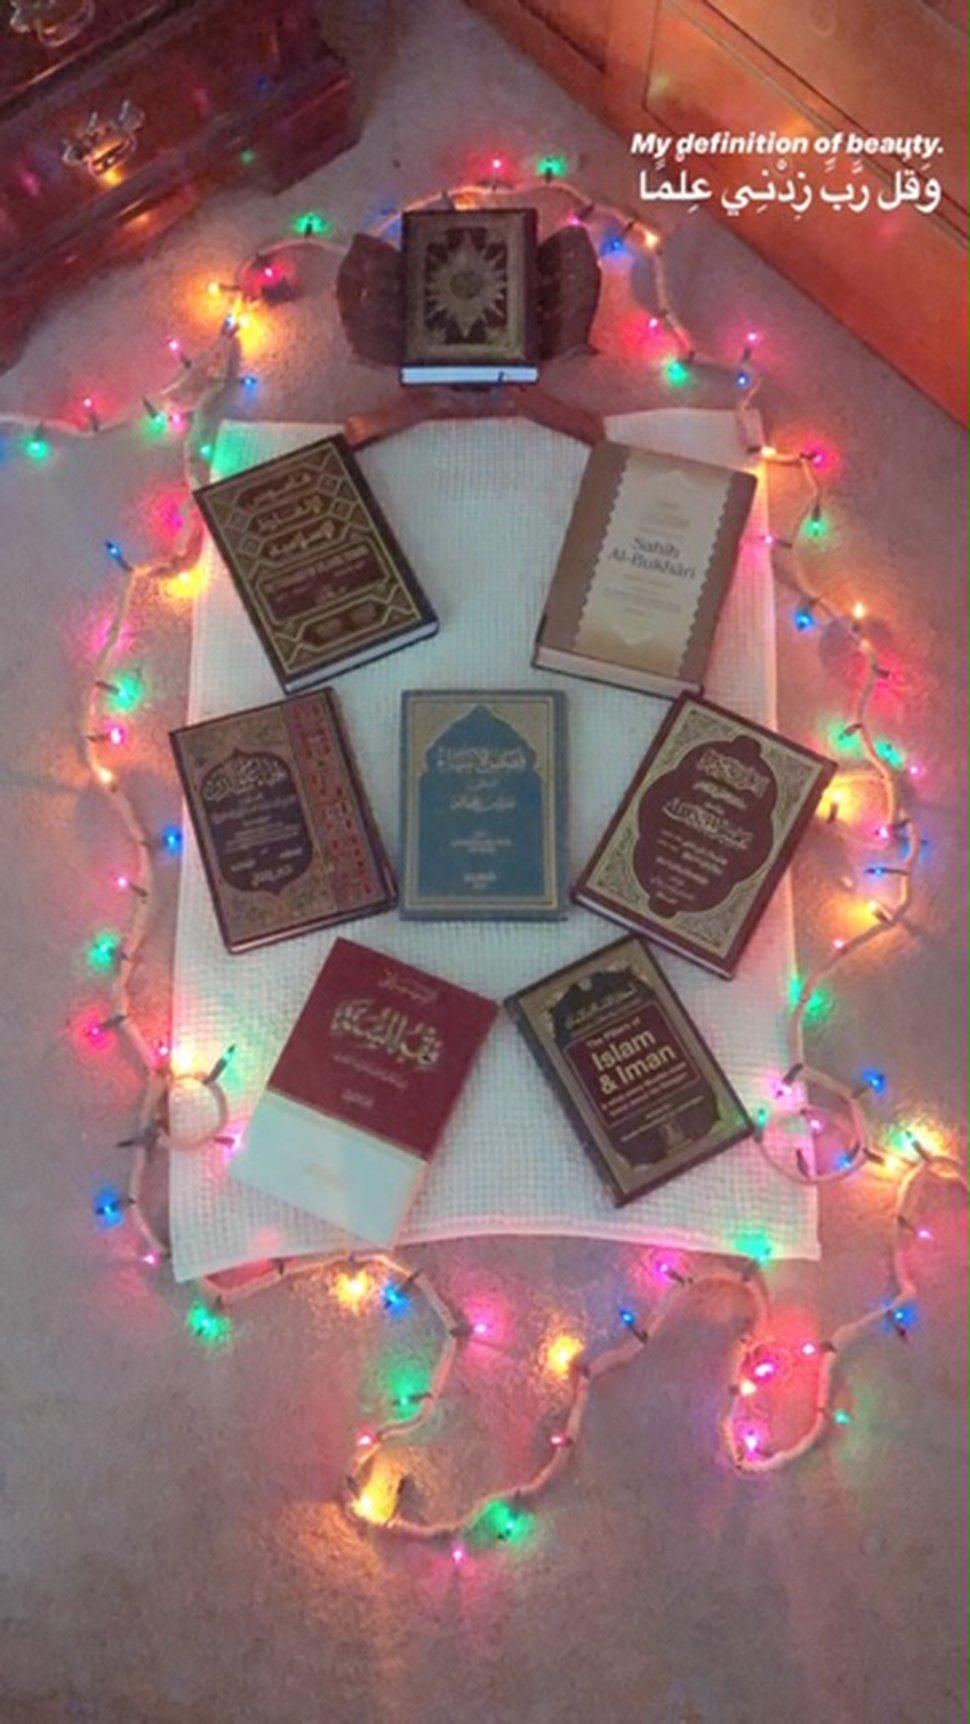 ( Photo courtesy of Yusra Sami) Yusra Sami has created a prayer space in her Salt Lake City home to use during Ramadan in 2020.